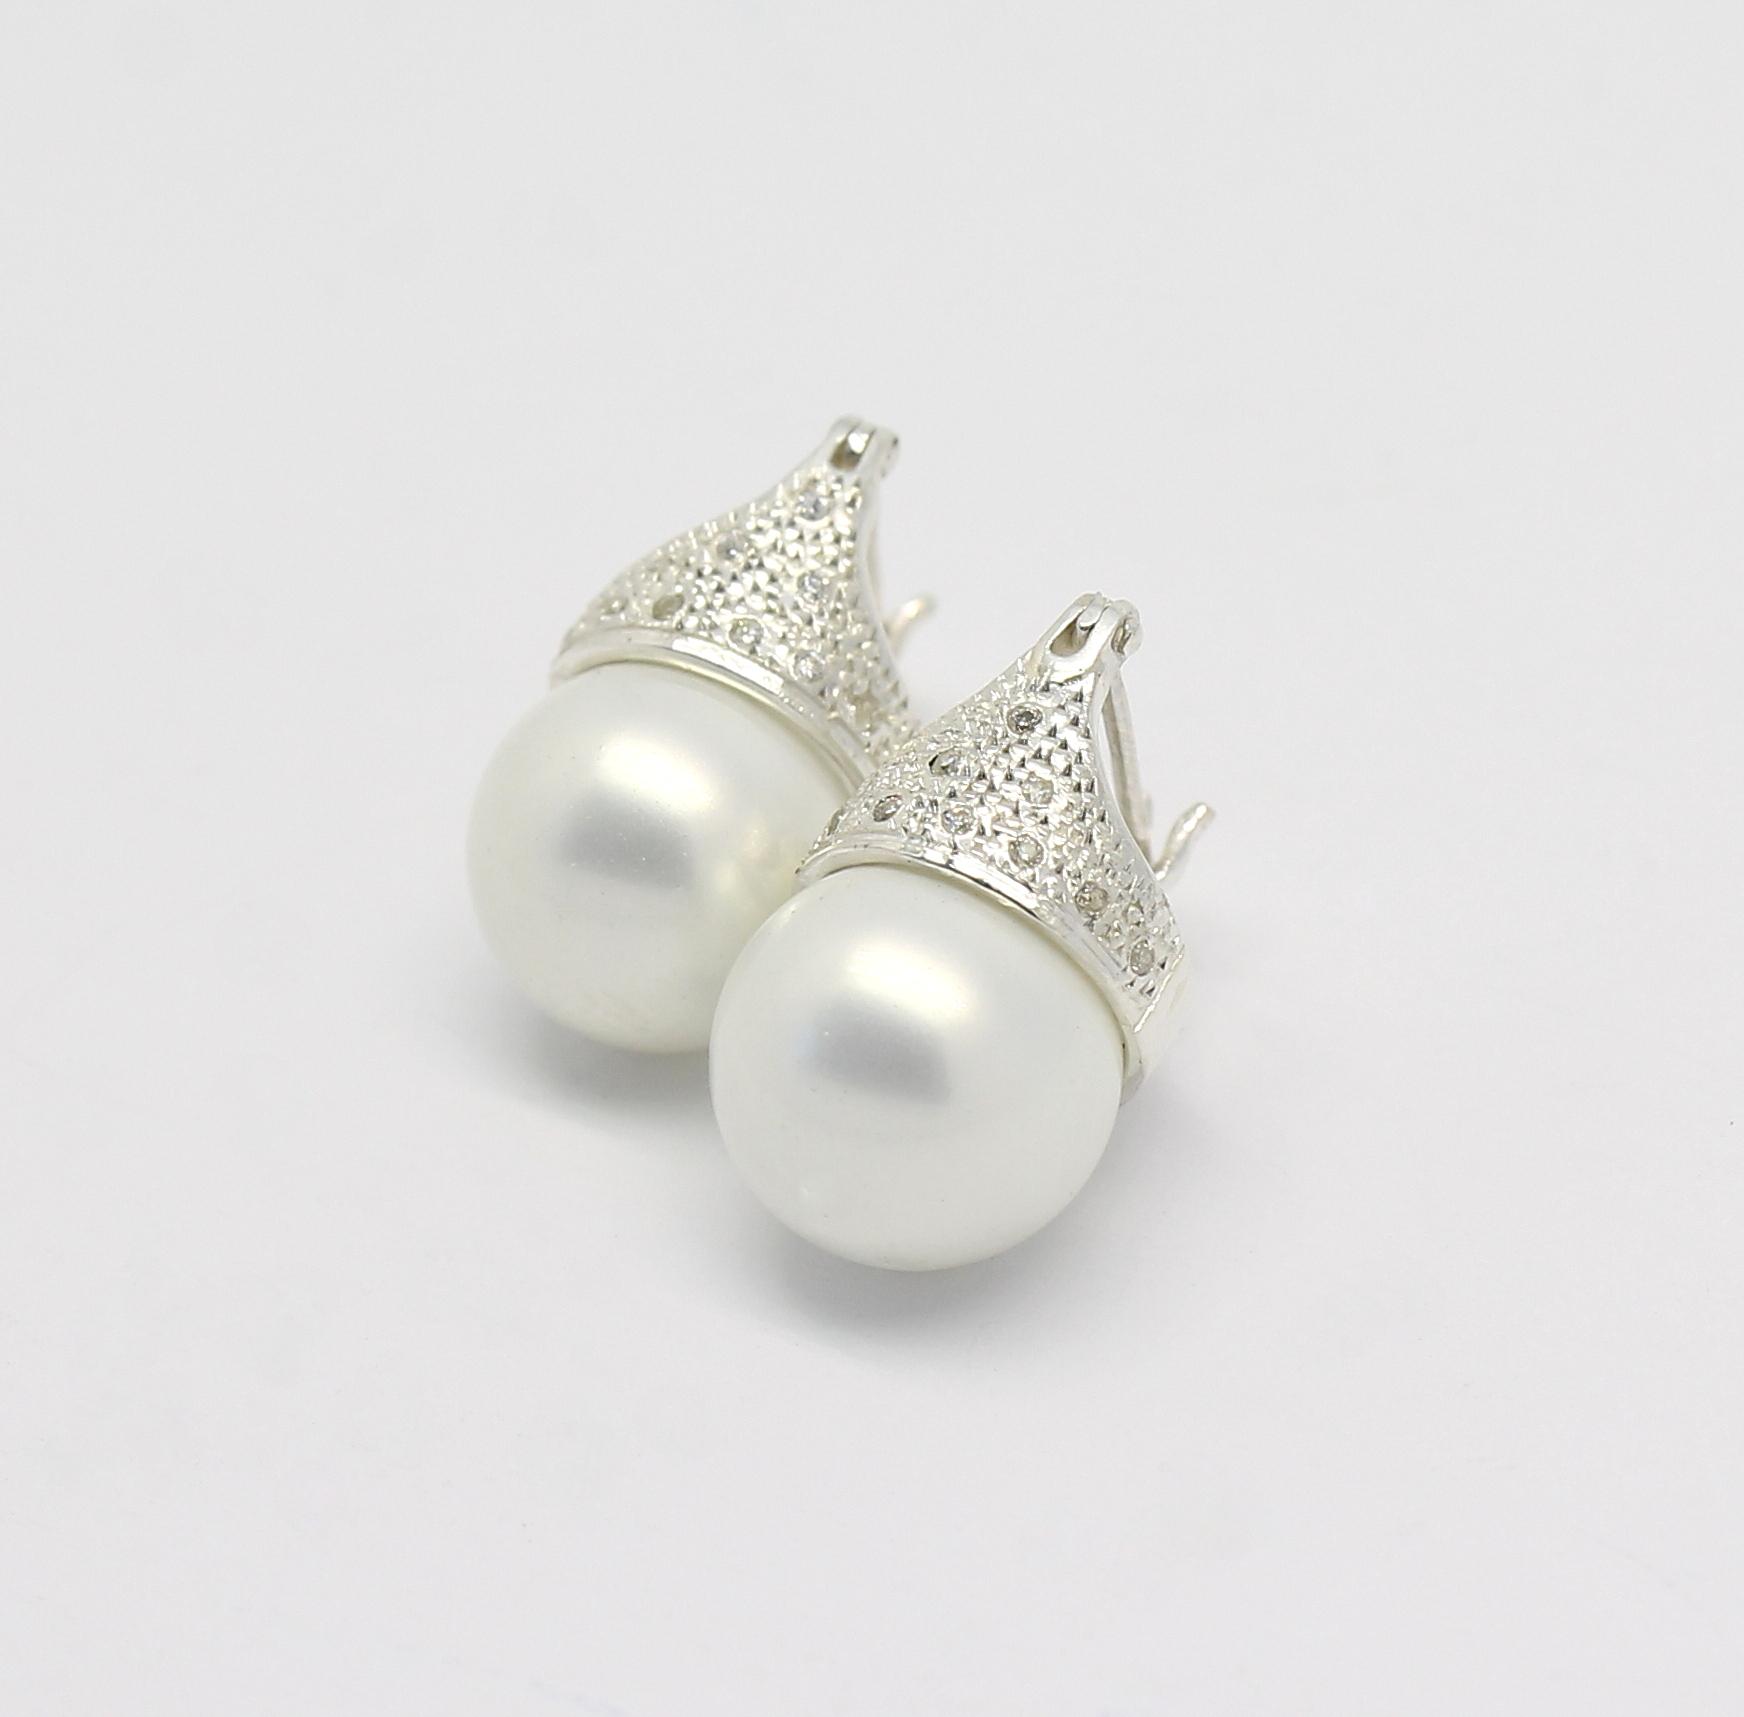 23e4e167831f7 Brinco Lady Di Diamante e Pérola Ouro 18k 750 - Marcio Joalheiros ...